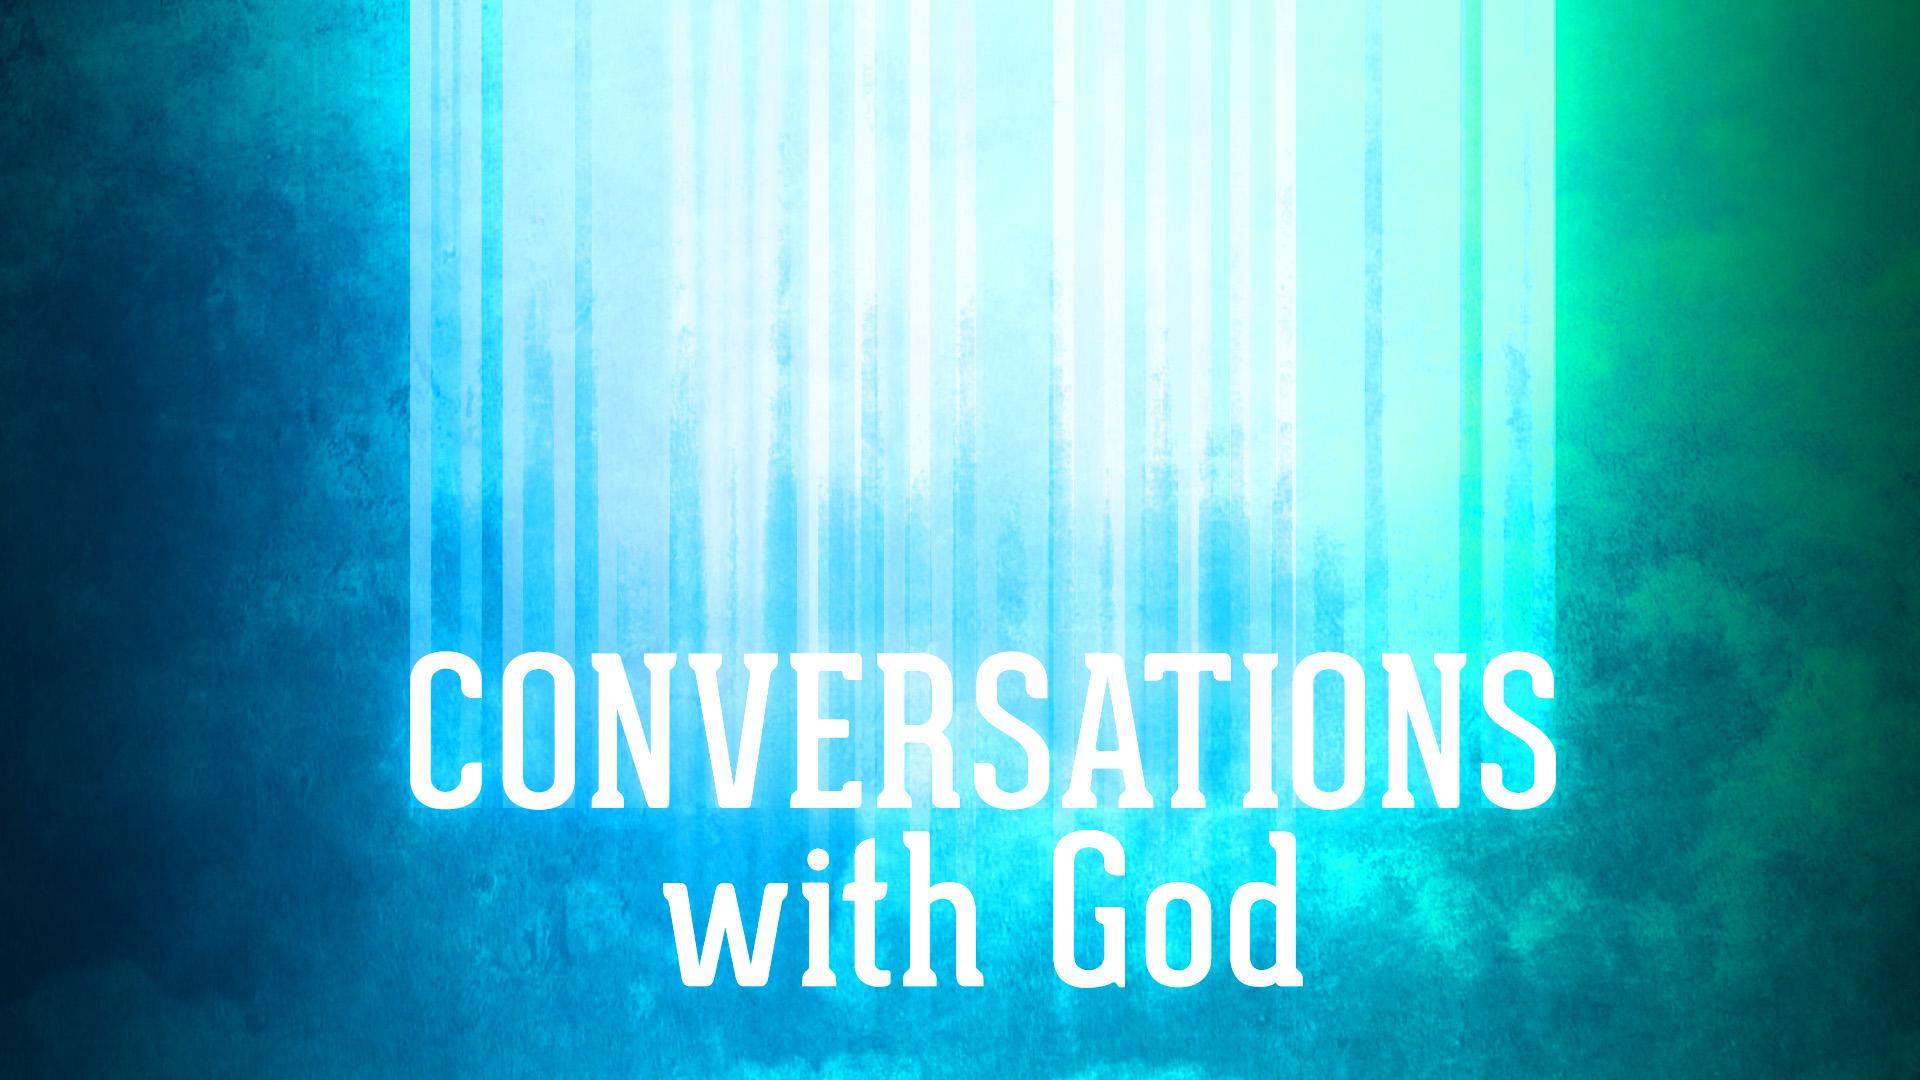 Conversations with God.jpg